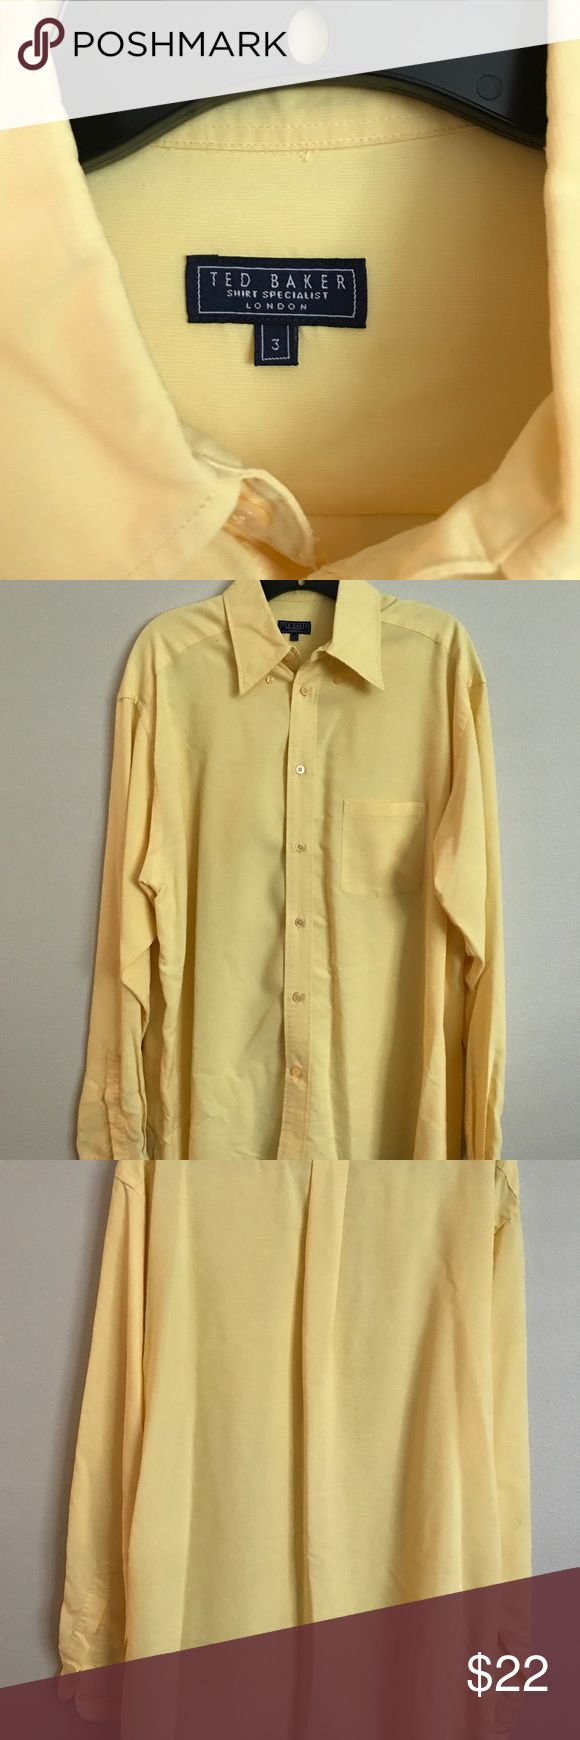 Ted Baker yellow shirt Ted Baker yellow shirt size 3. Baker by Ted Baker Shirts Dress Shirts